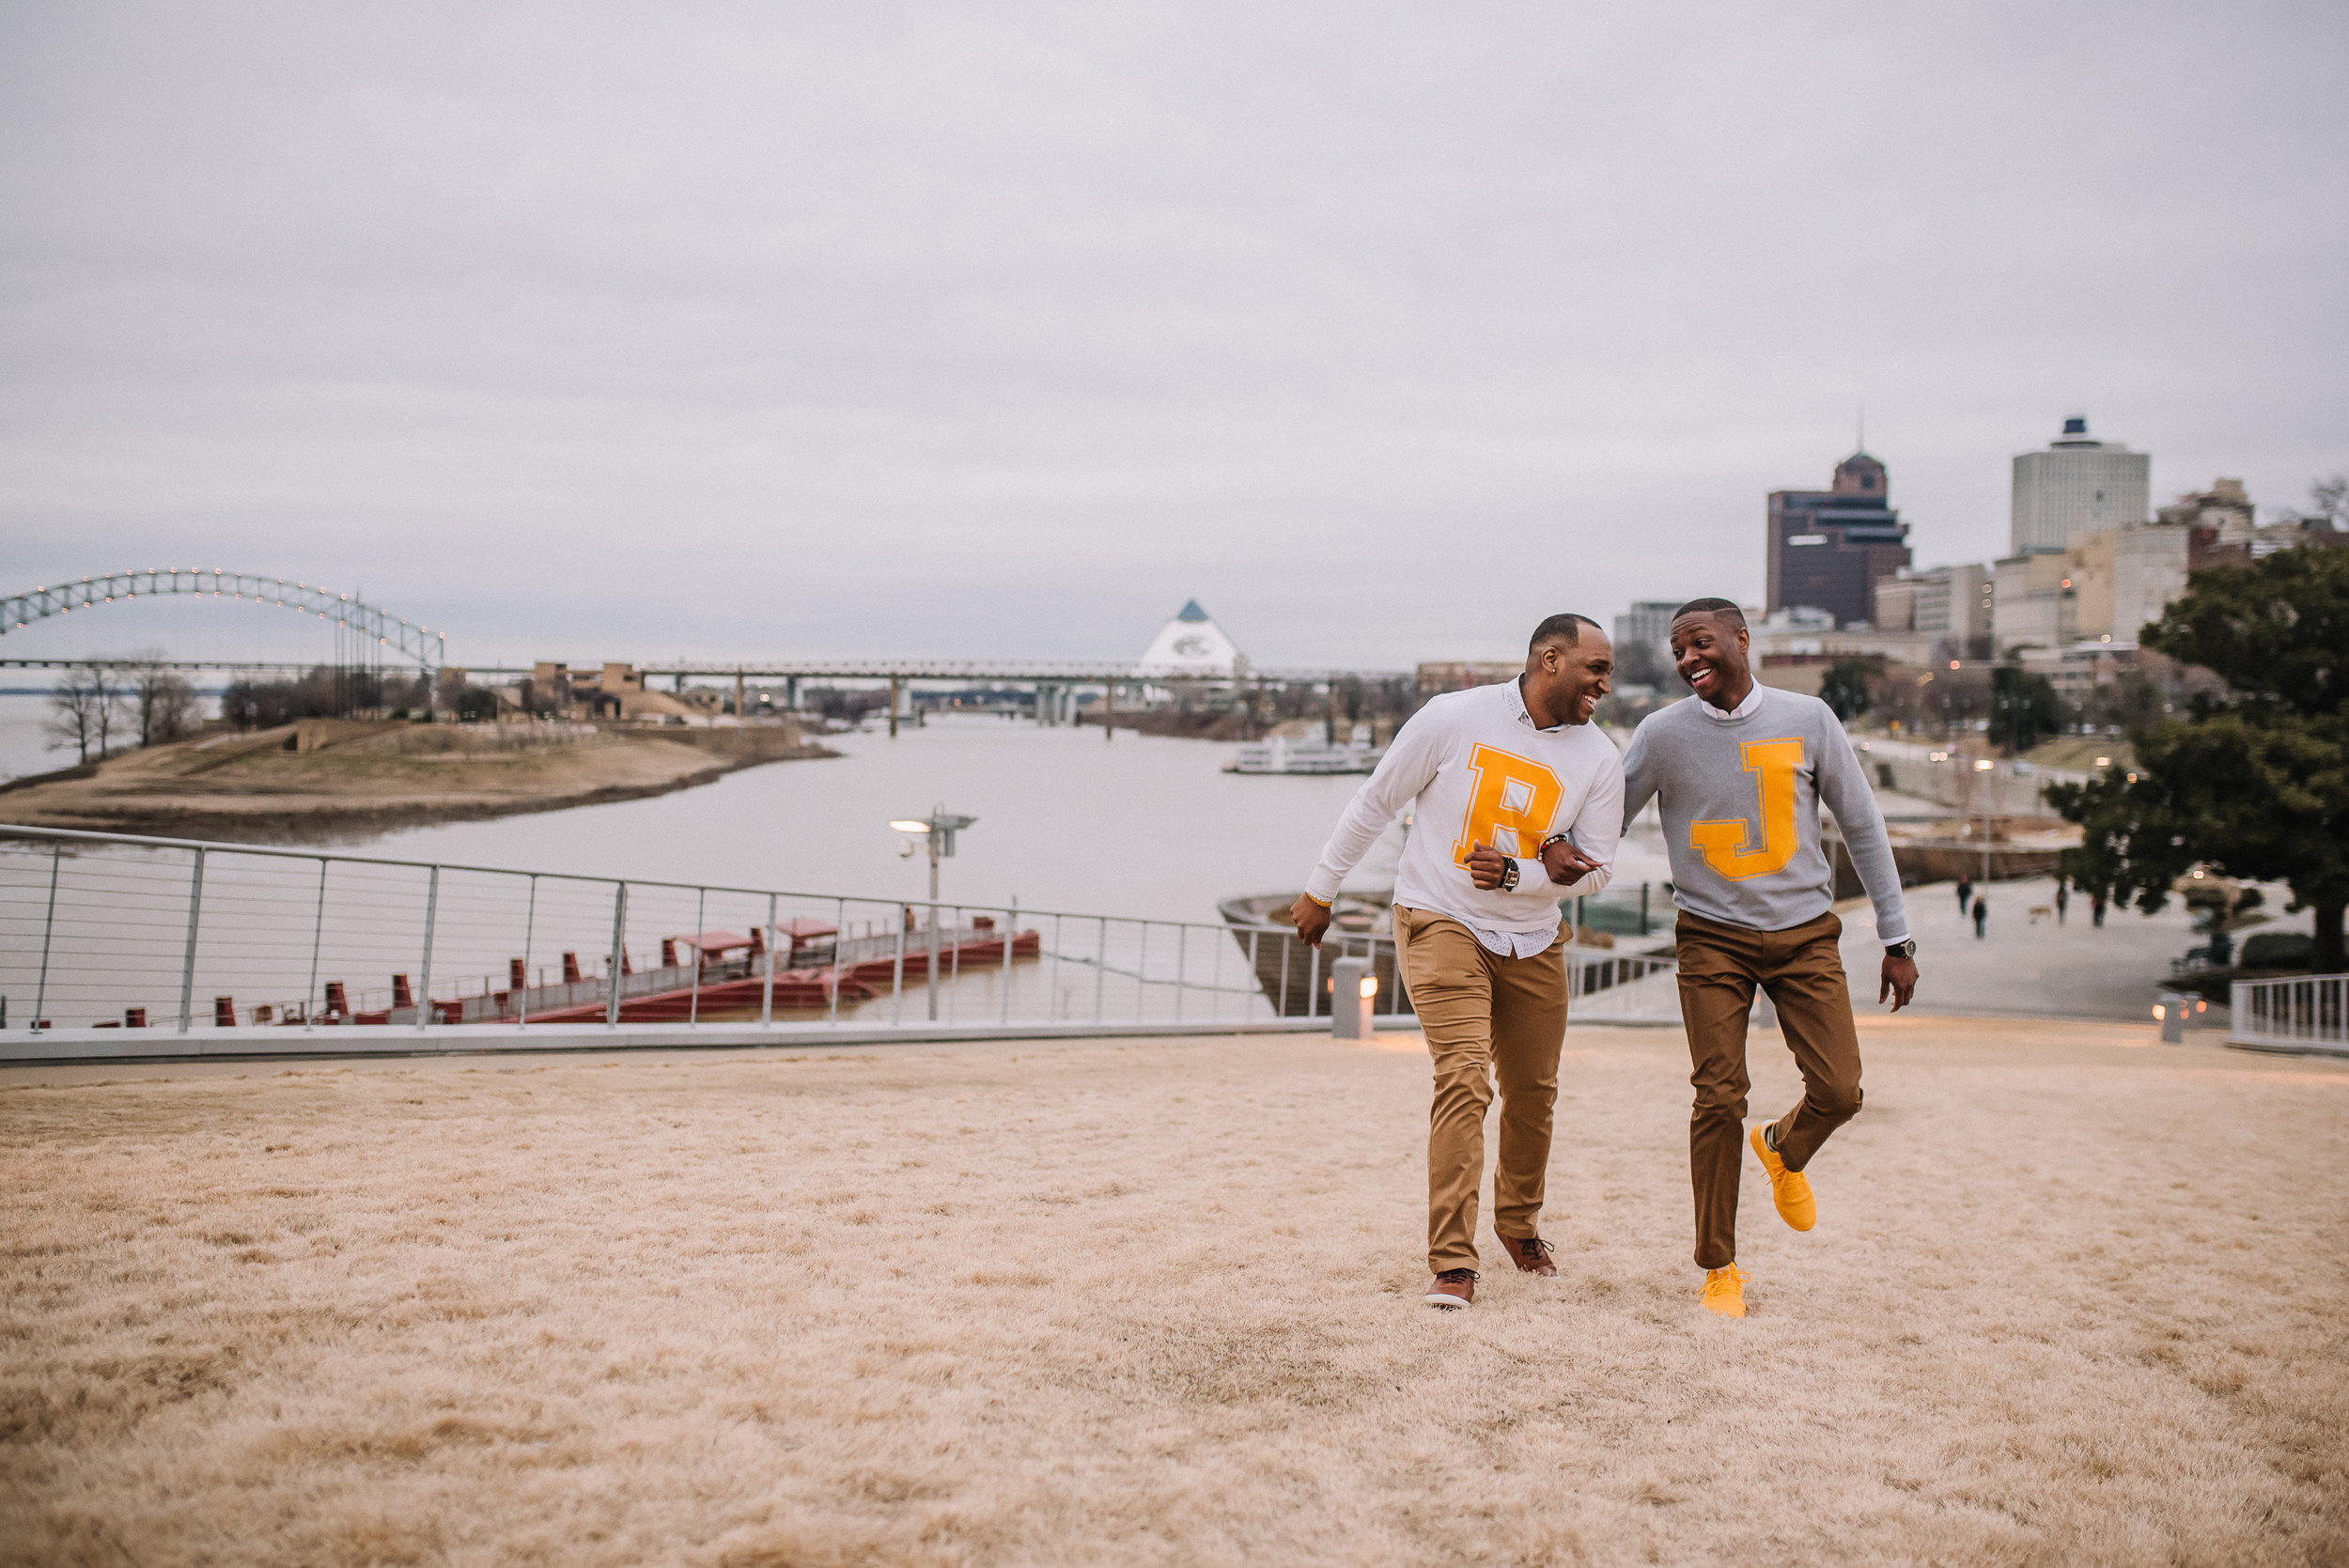 L+J_Couples-Session_Overton-Park_Downtown-Memphis_Ashley-Benham-Photography-167.jpg